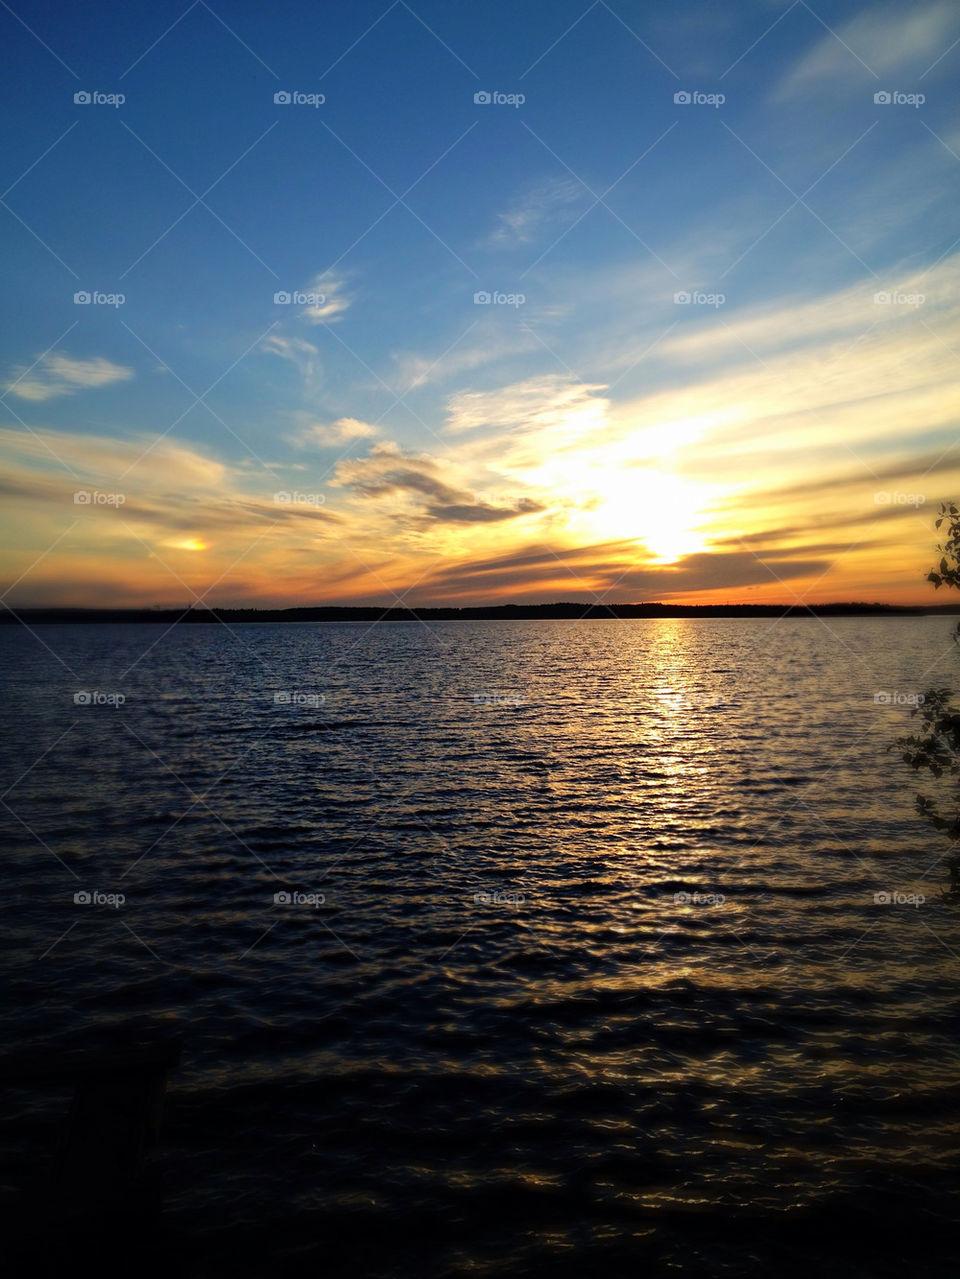 sky sunset sun water by kekejari